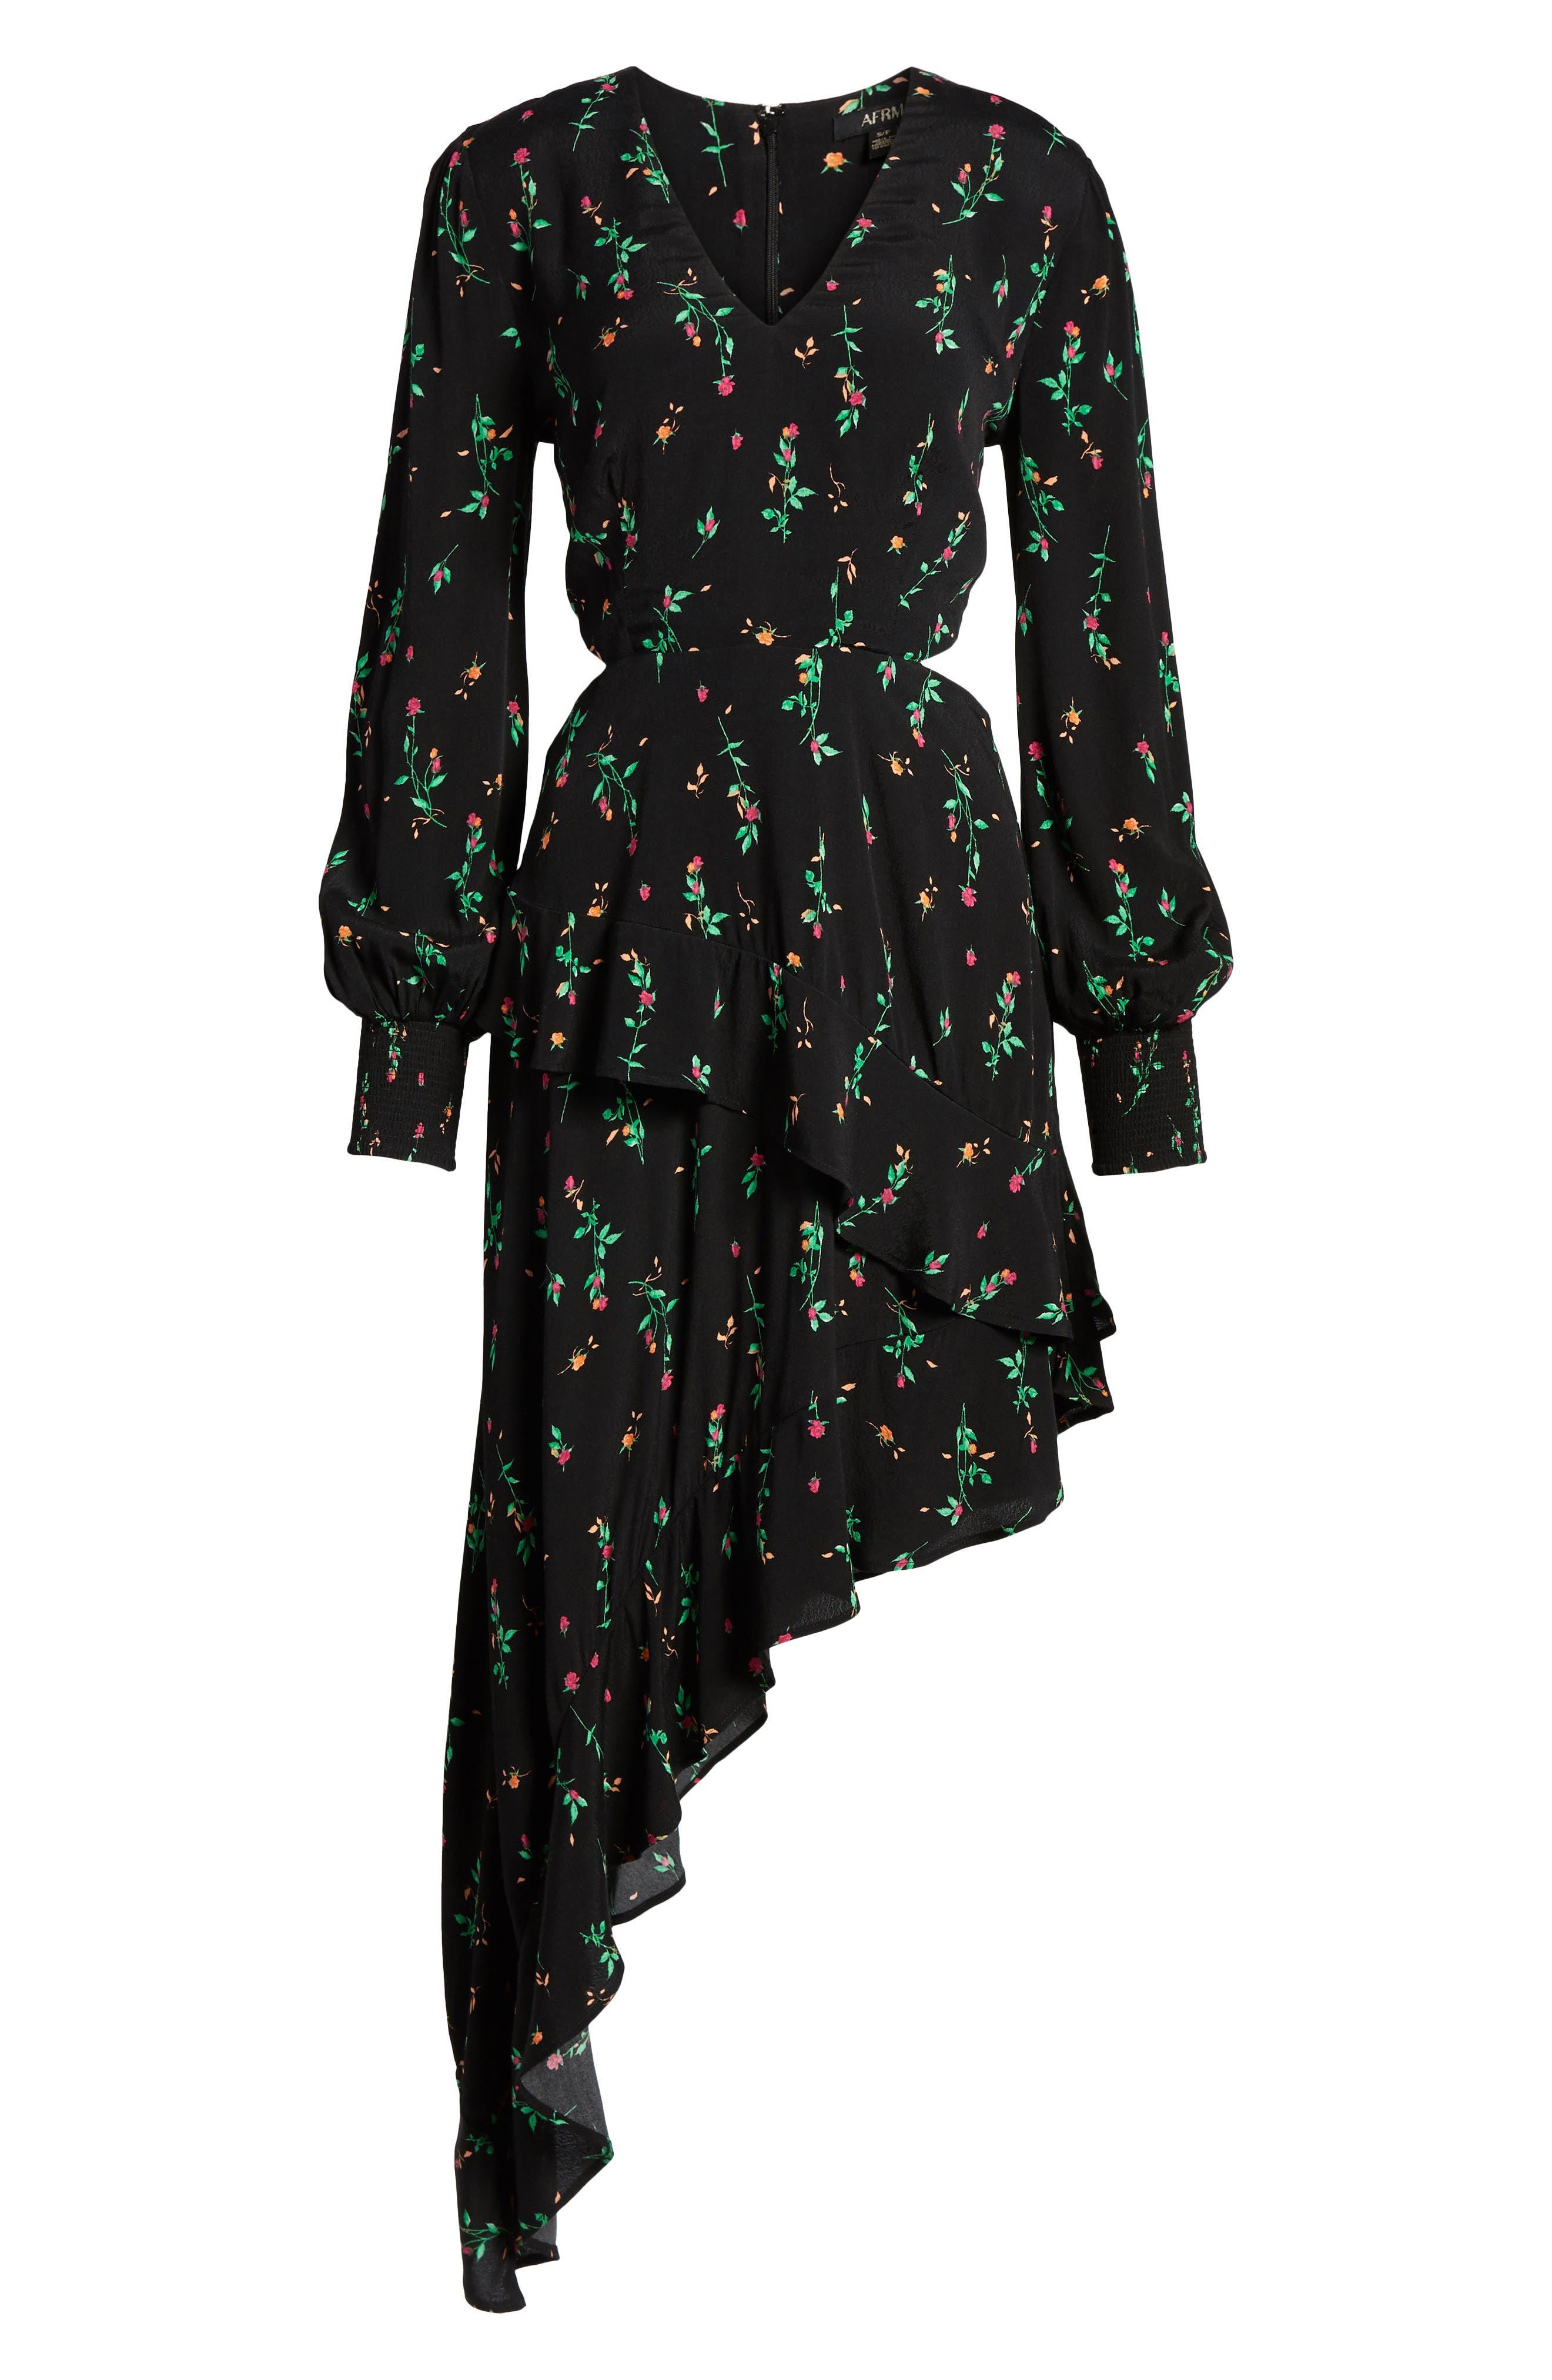 Mabel Cutout Asymmetrical Dress,                             Alternate thumbnail 6, color,                             001